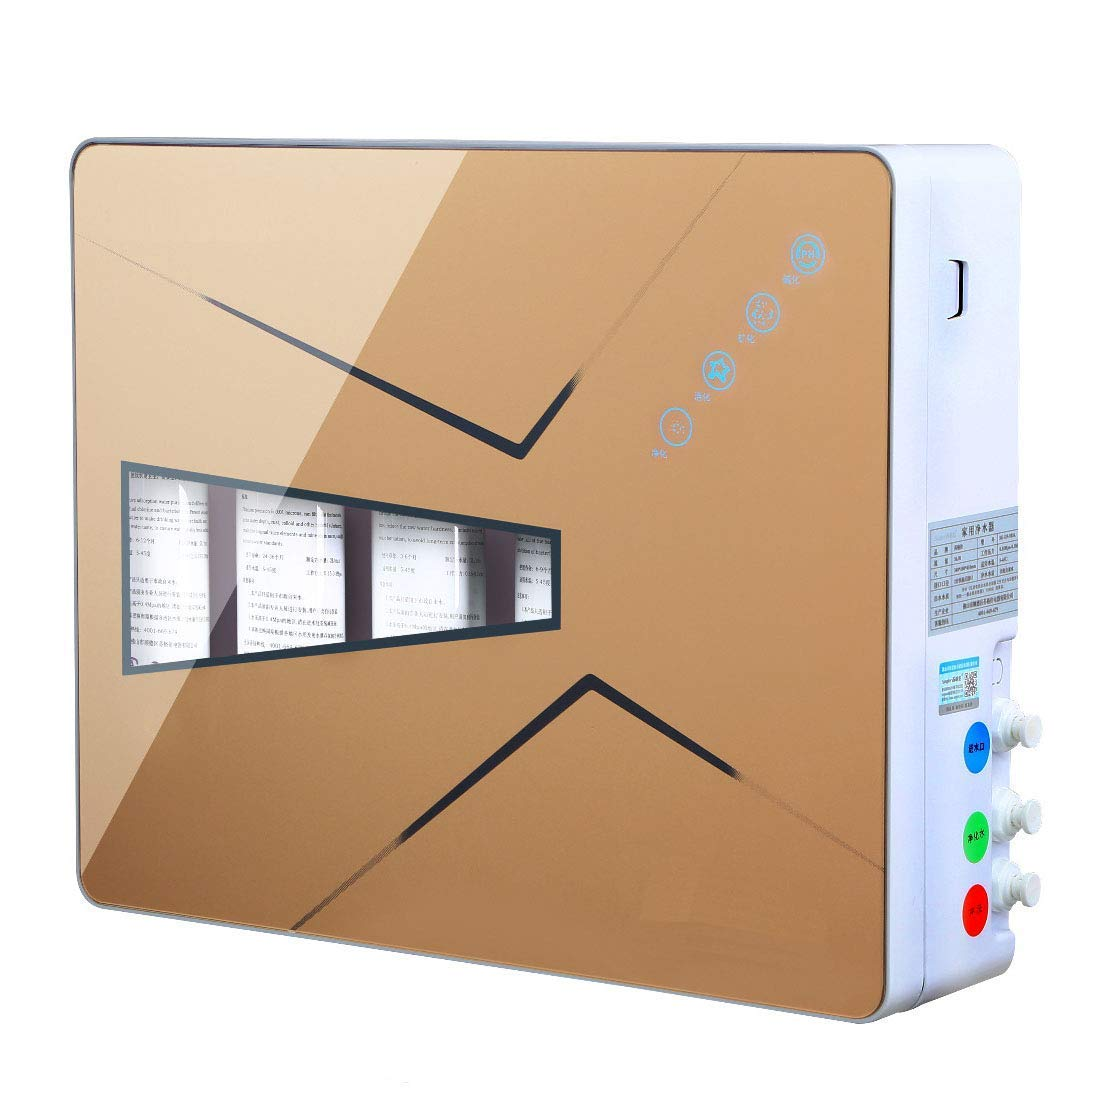 Oudan Haushalt 5 Level Ultrafiltration Wasserfilter (Farbe   -, -, -, Größe   -) 5b359b